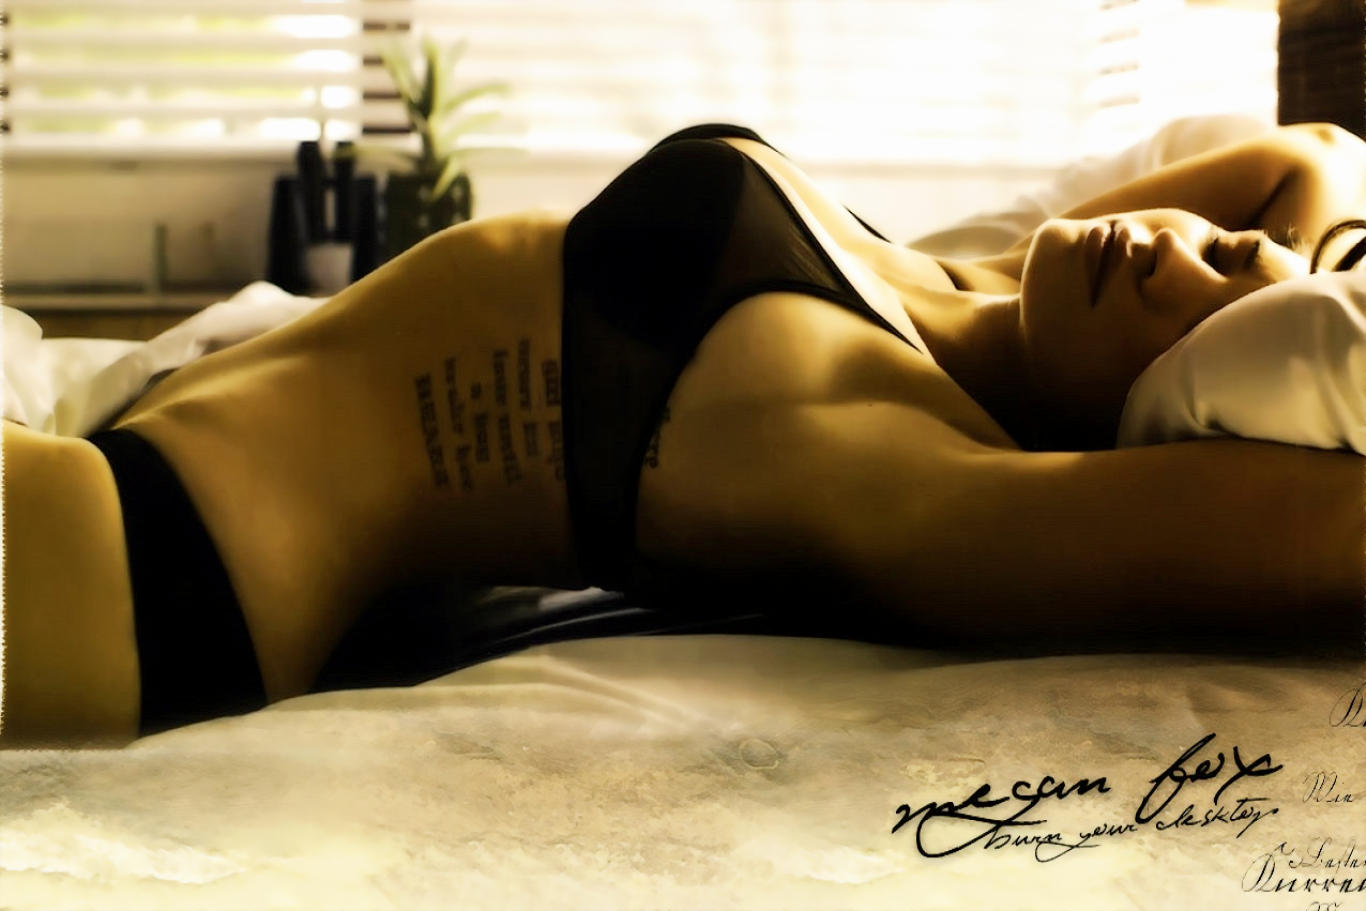 Megan Fox Black Lingerie Hot Wallpaper